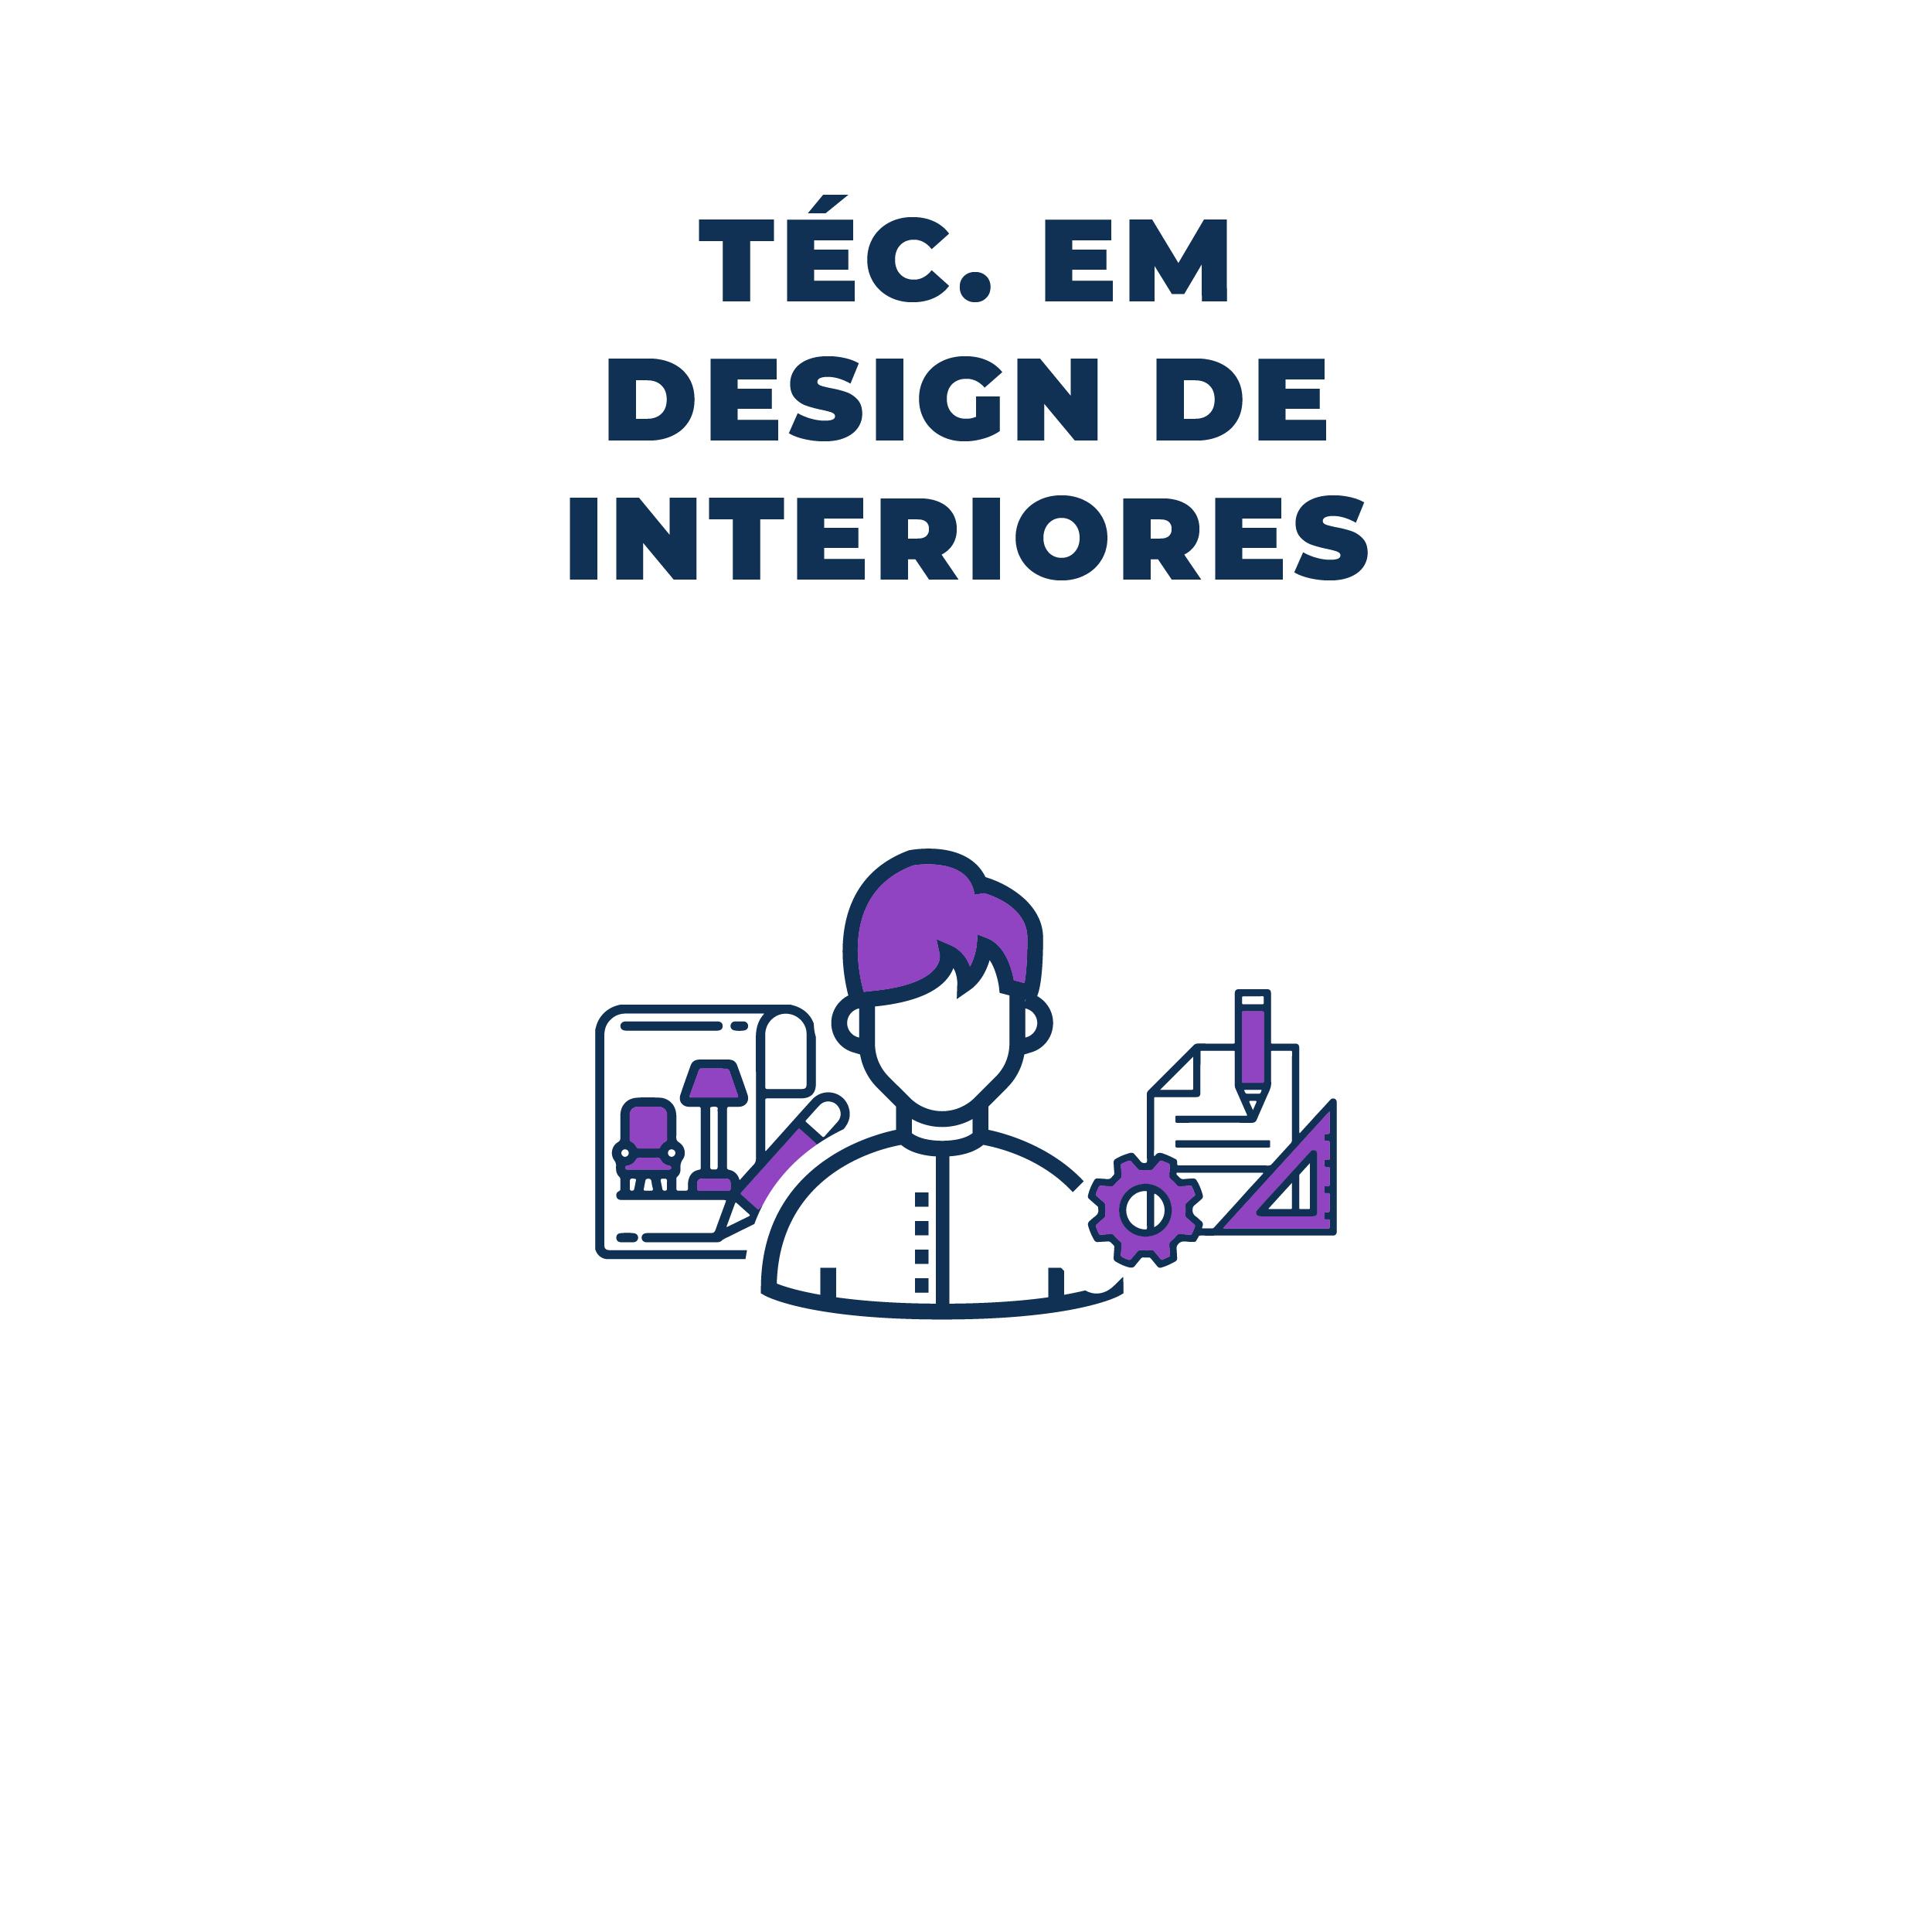 design inte